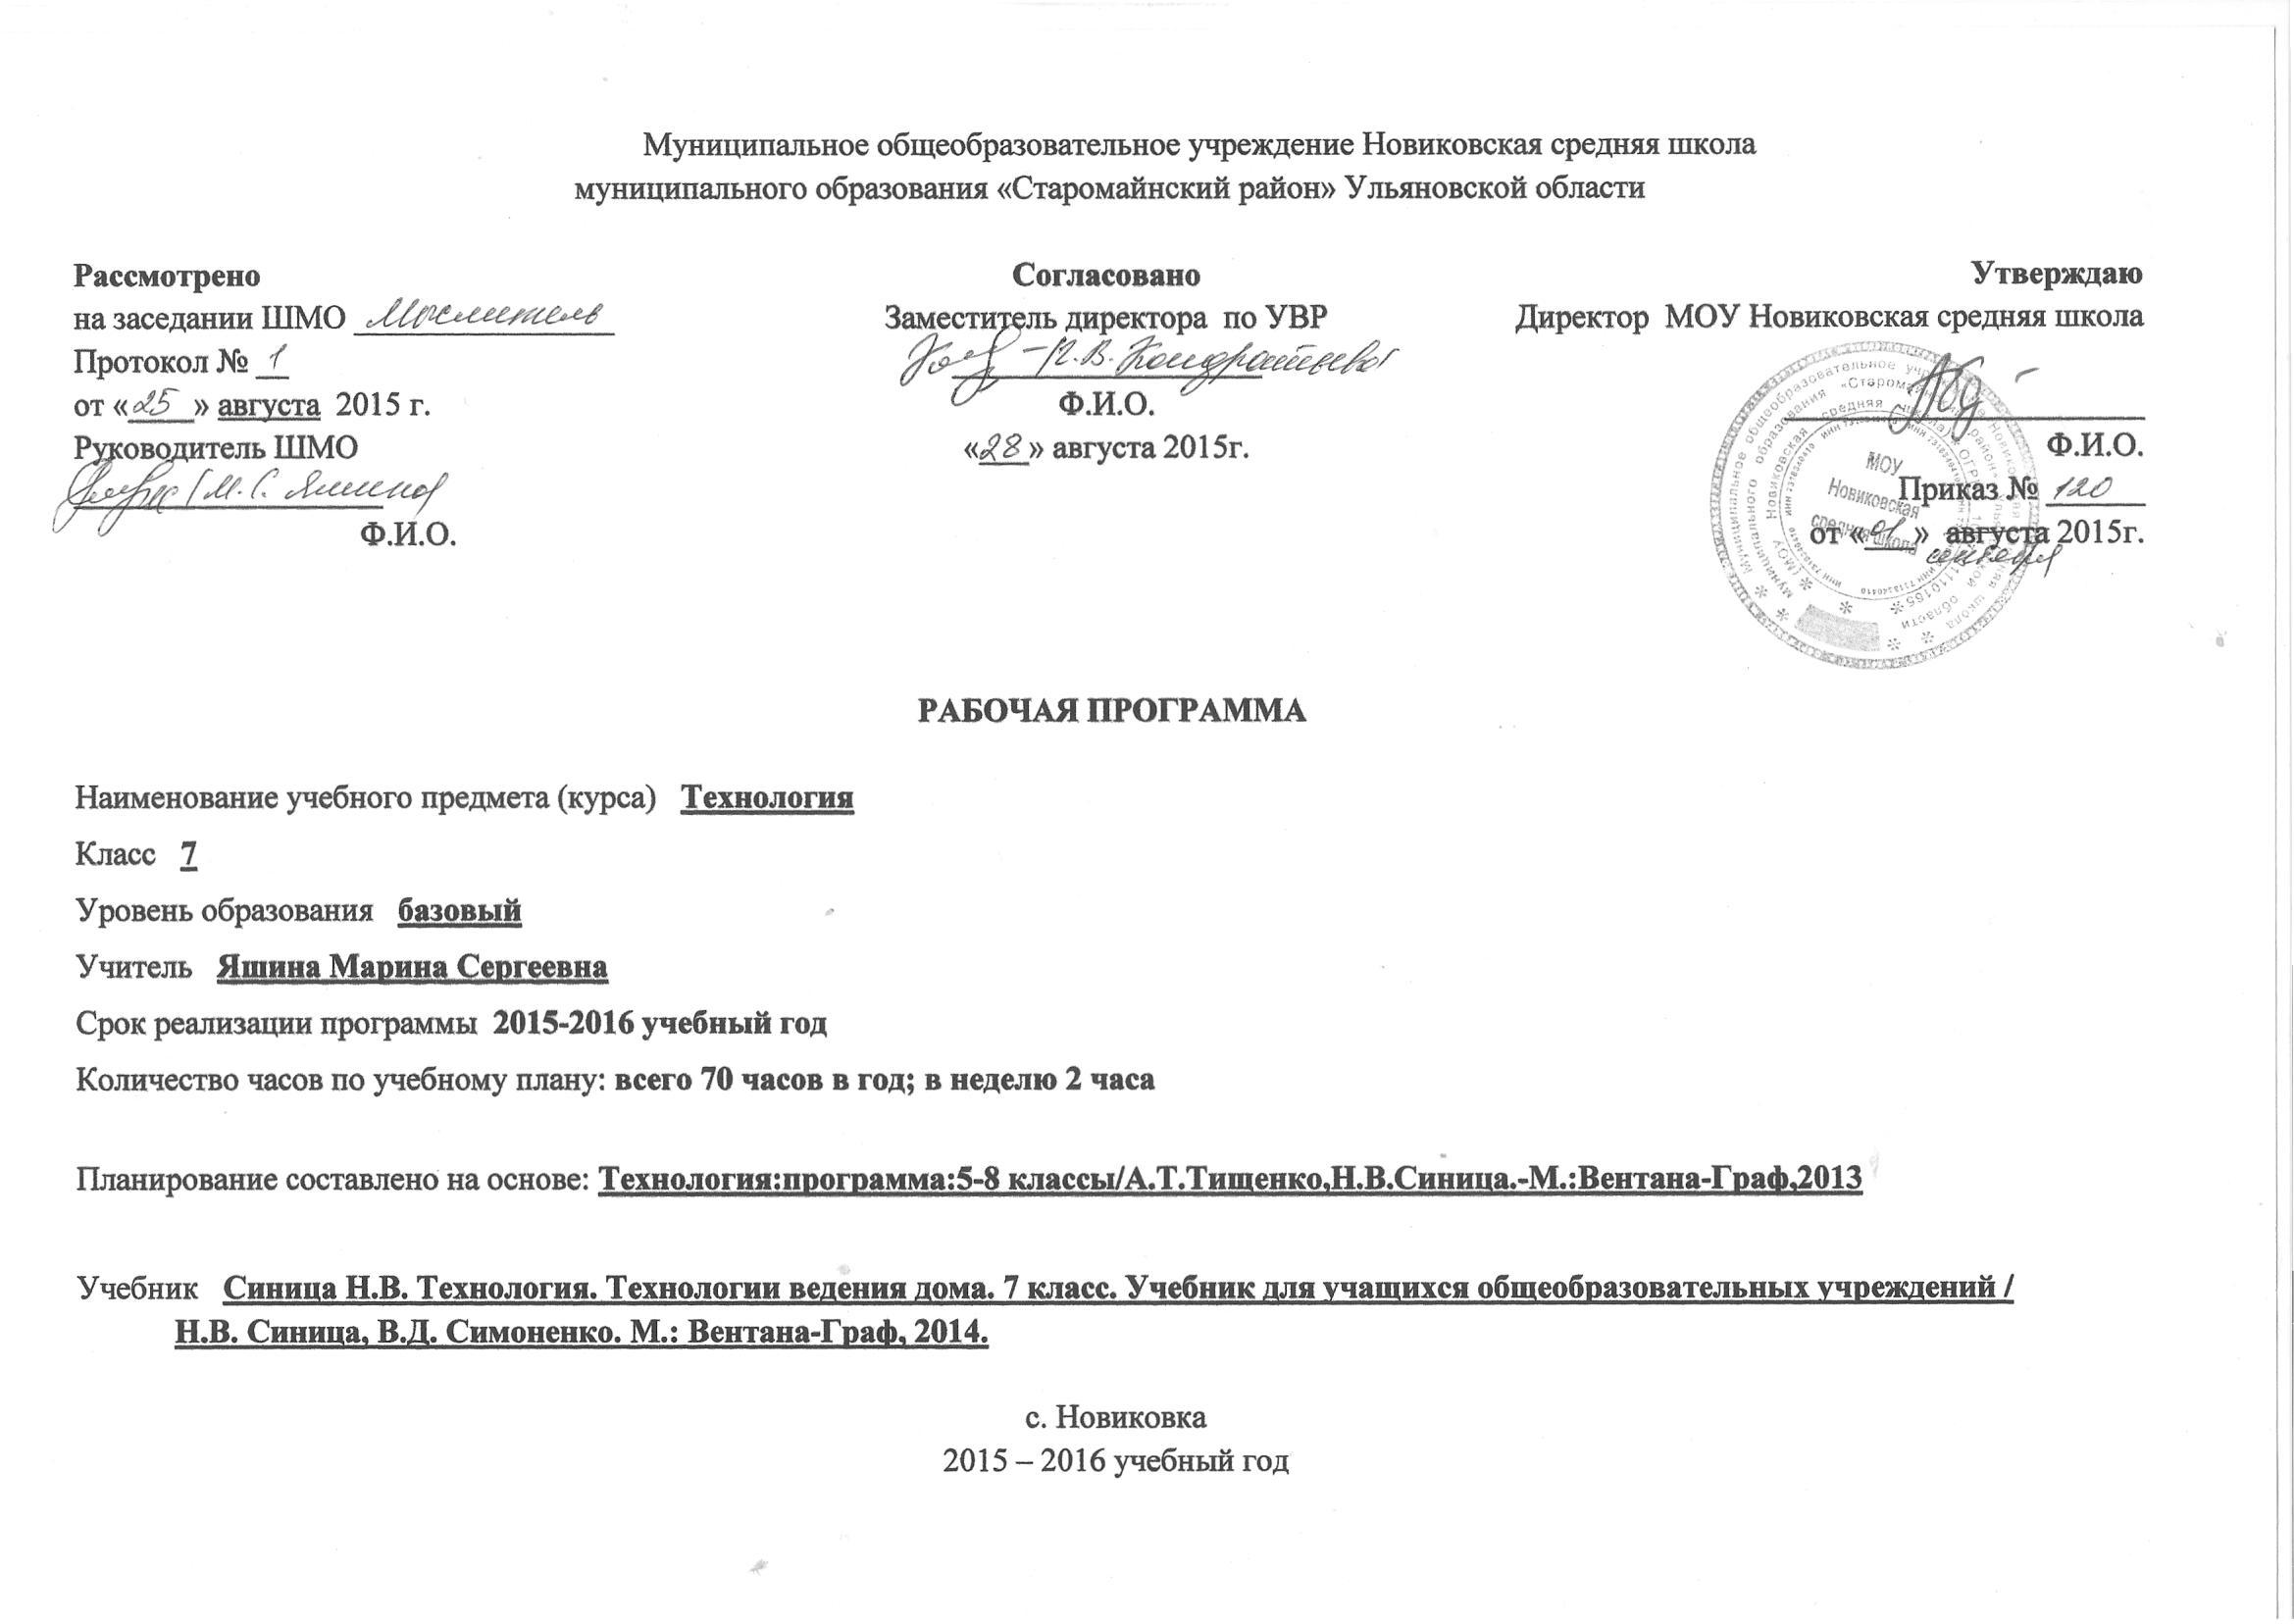 C:\Users\user\Documents\МС скан\2.tif